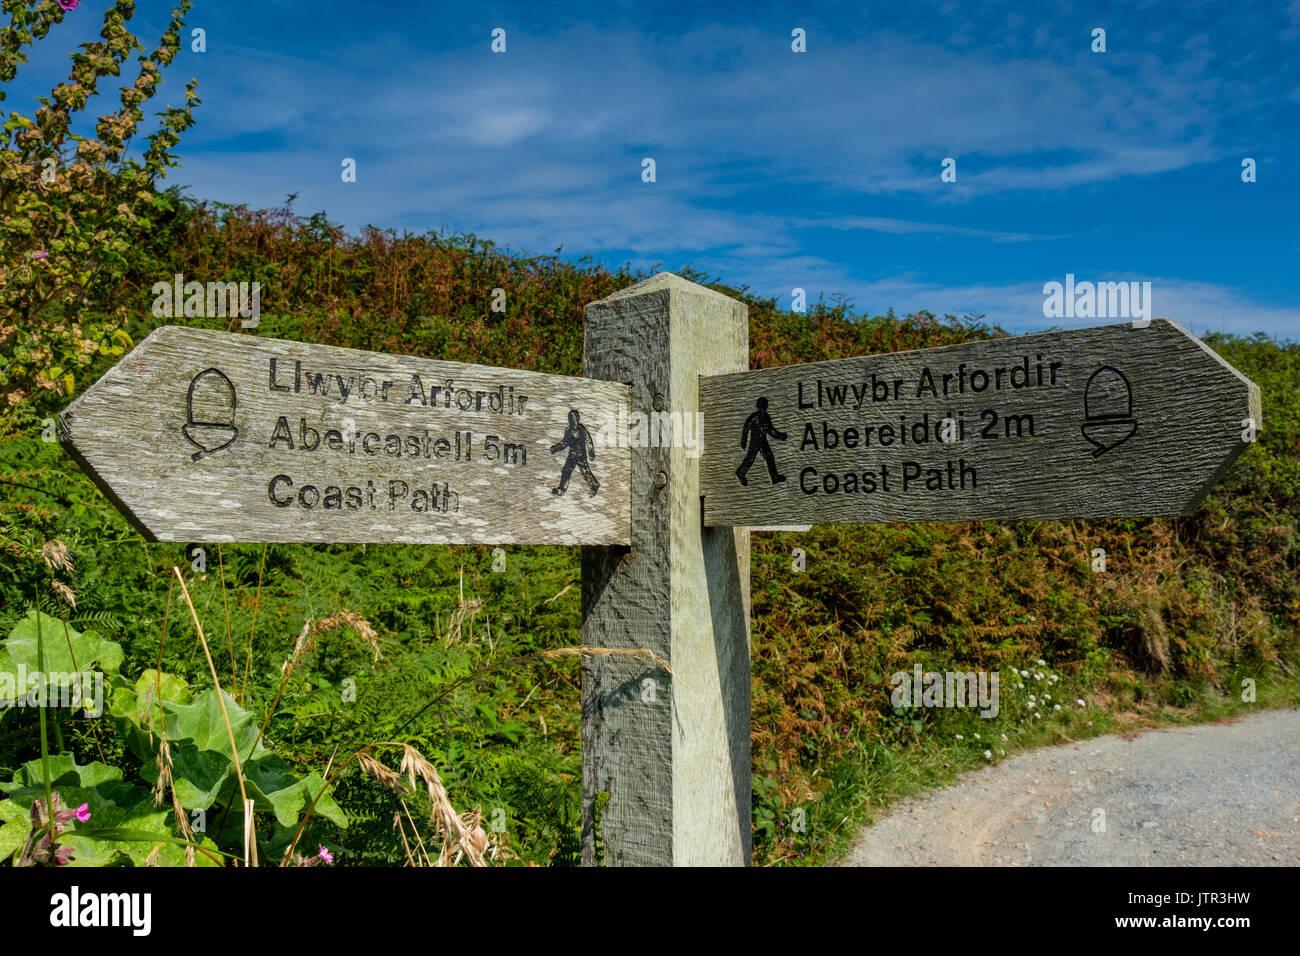 Signpost on the Wales/Pembrokeshire Coast Path near Porthgain, Pembrokeshire, Wales - Stock Image